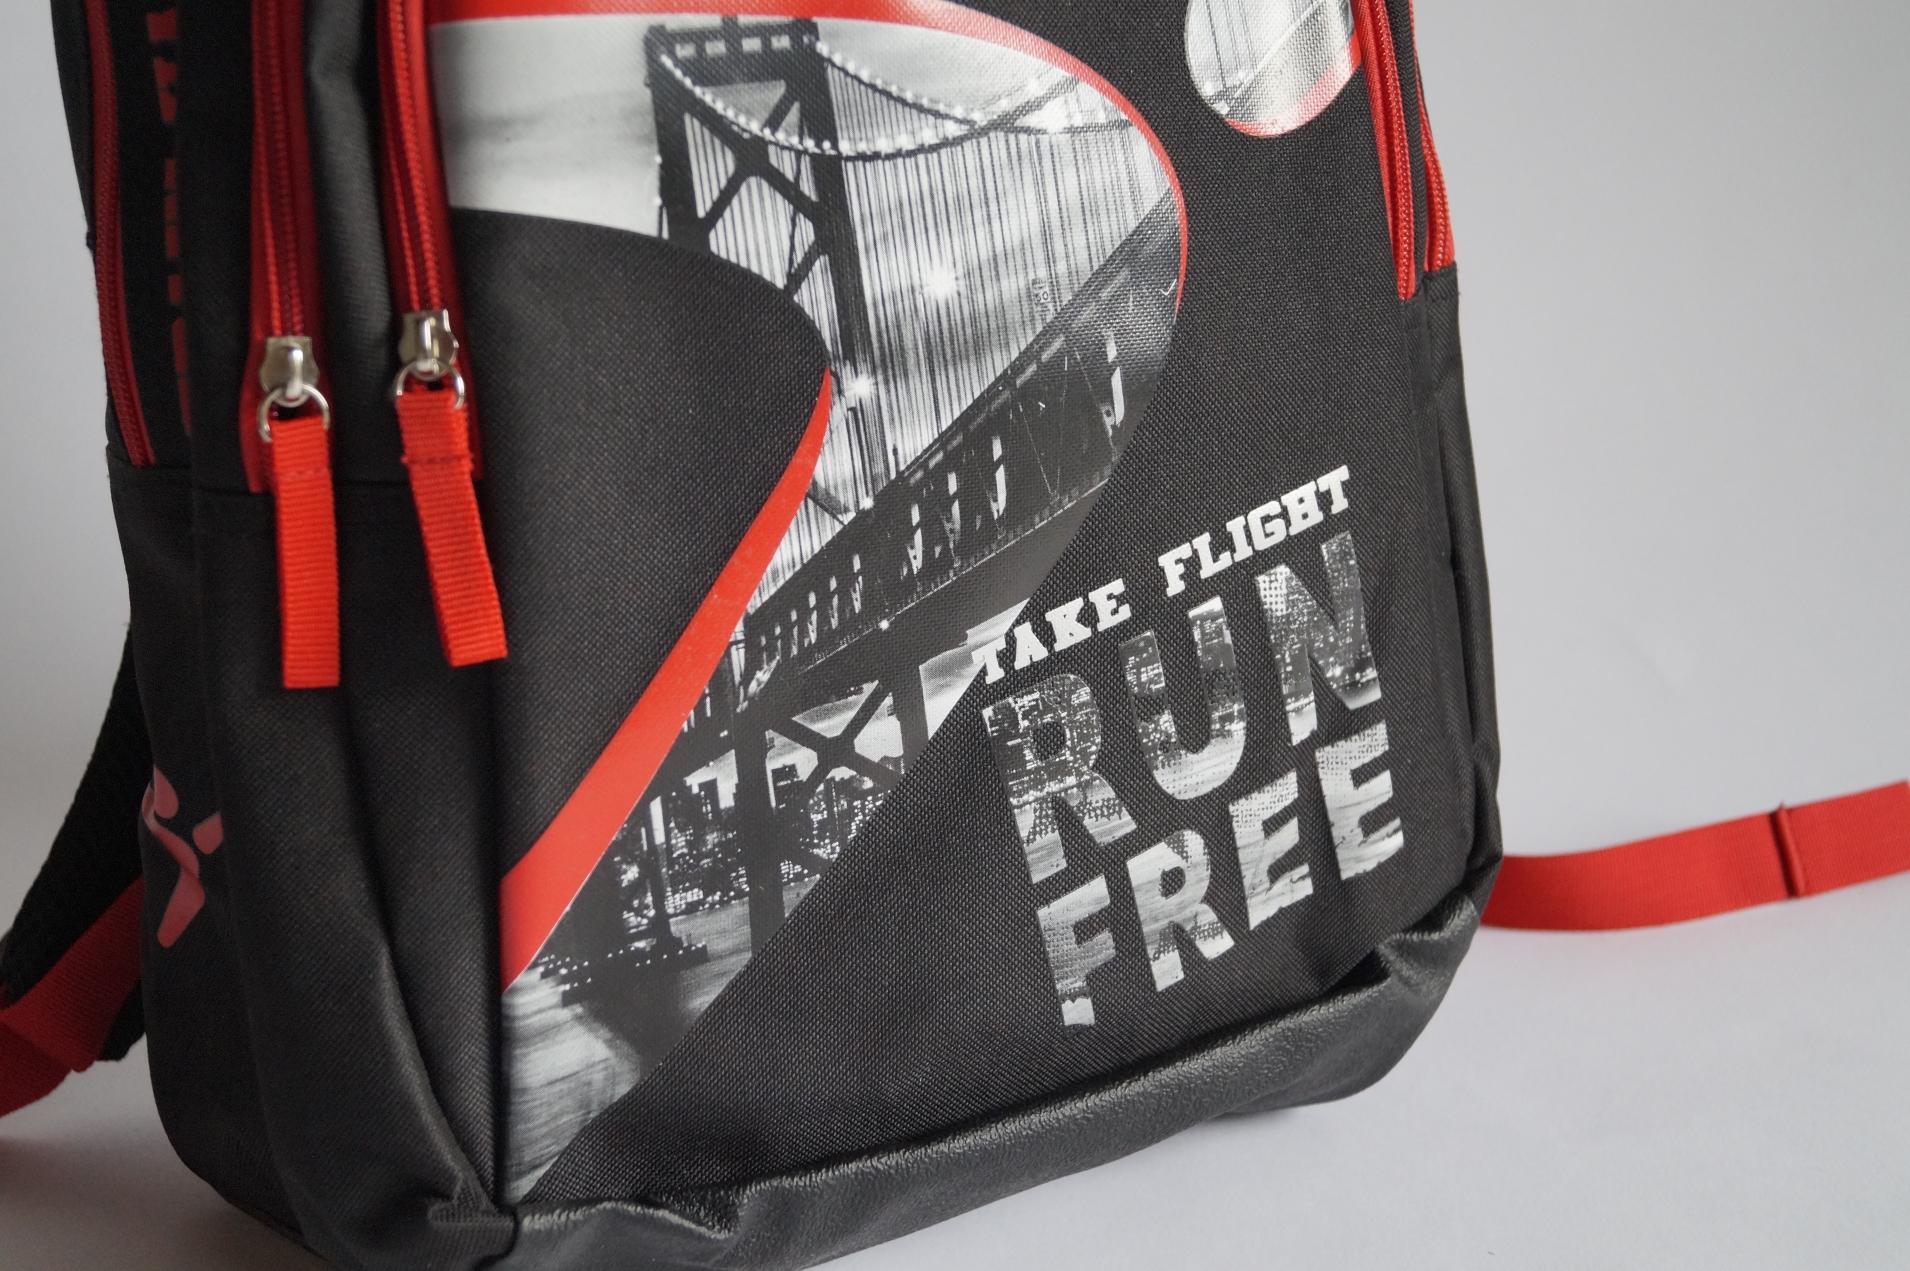 run-free-city-backpack-art.jpg